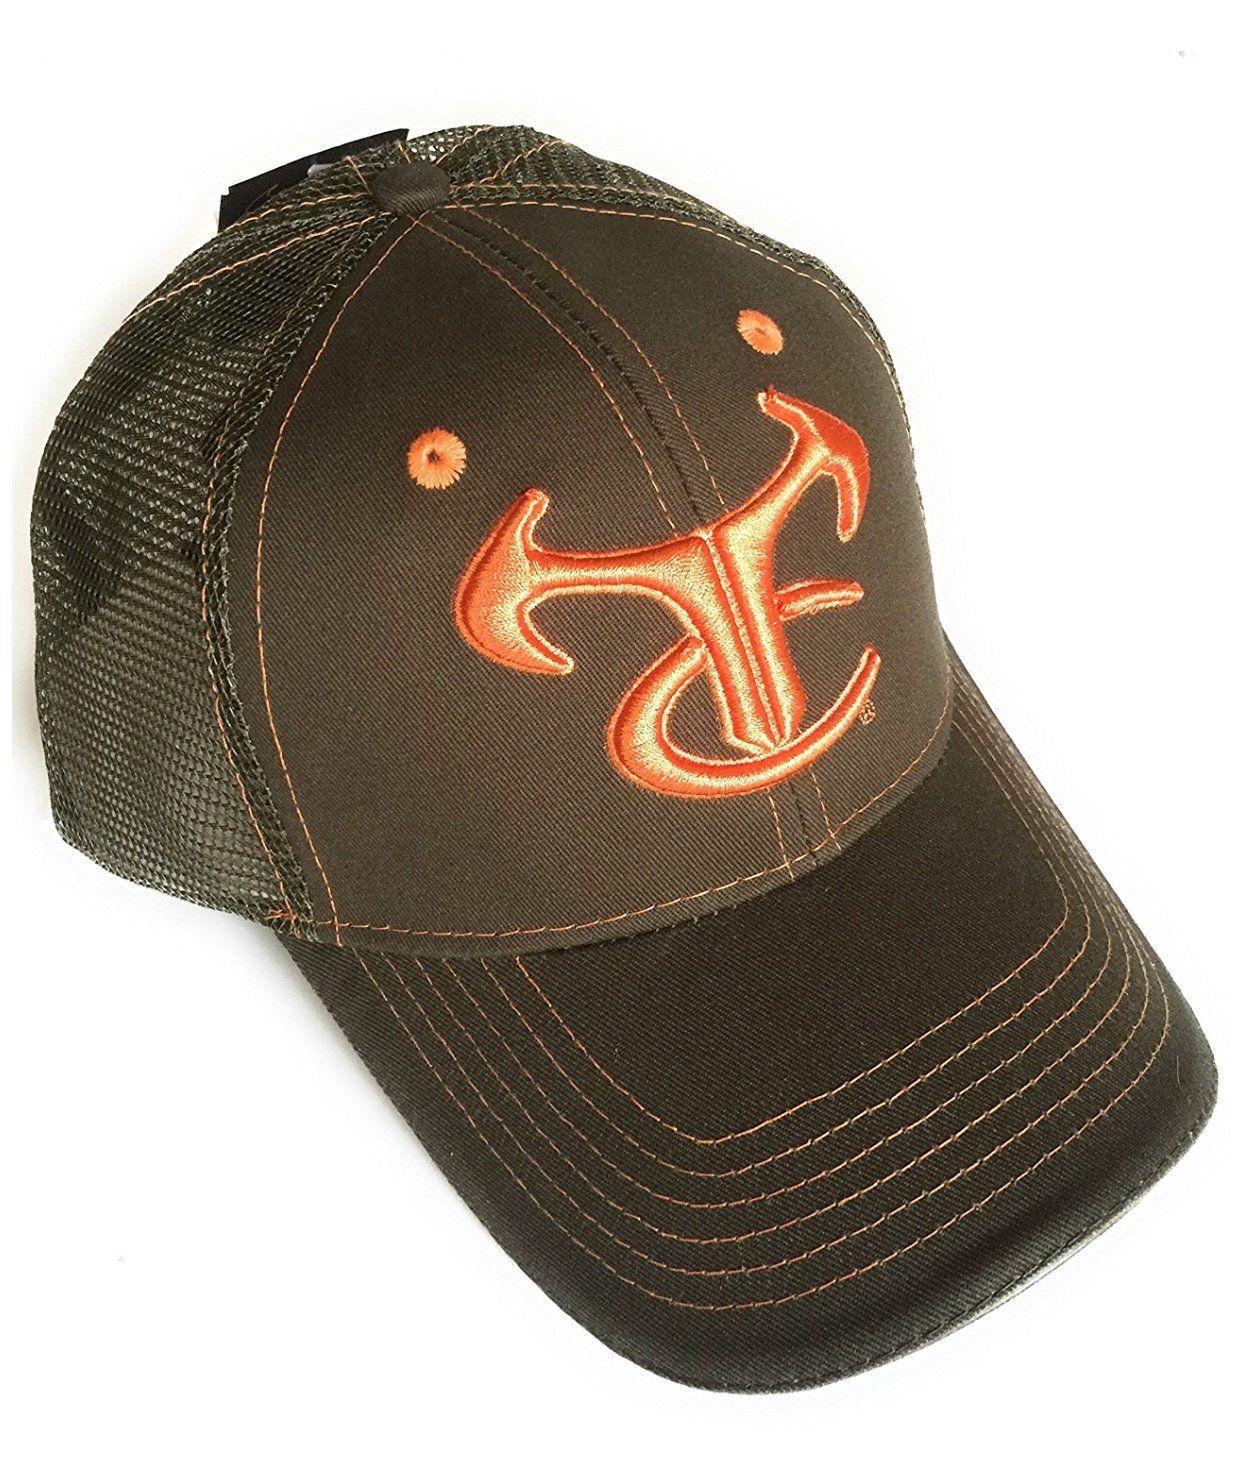 9b6ed4b0d True Timber Hat (Olive). True Timber Hats. One Size Fits Most ...